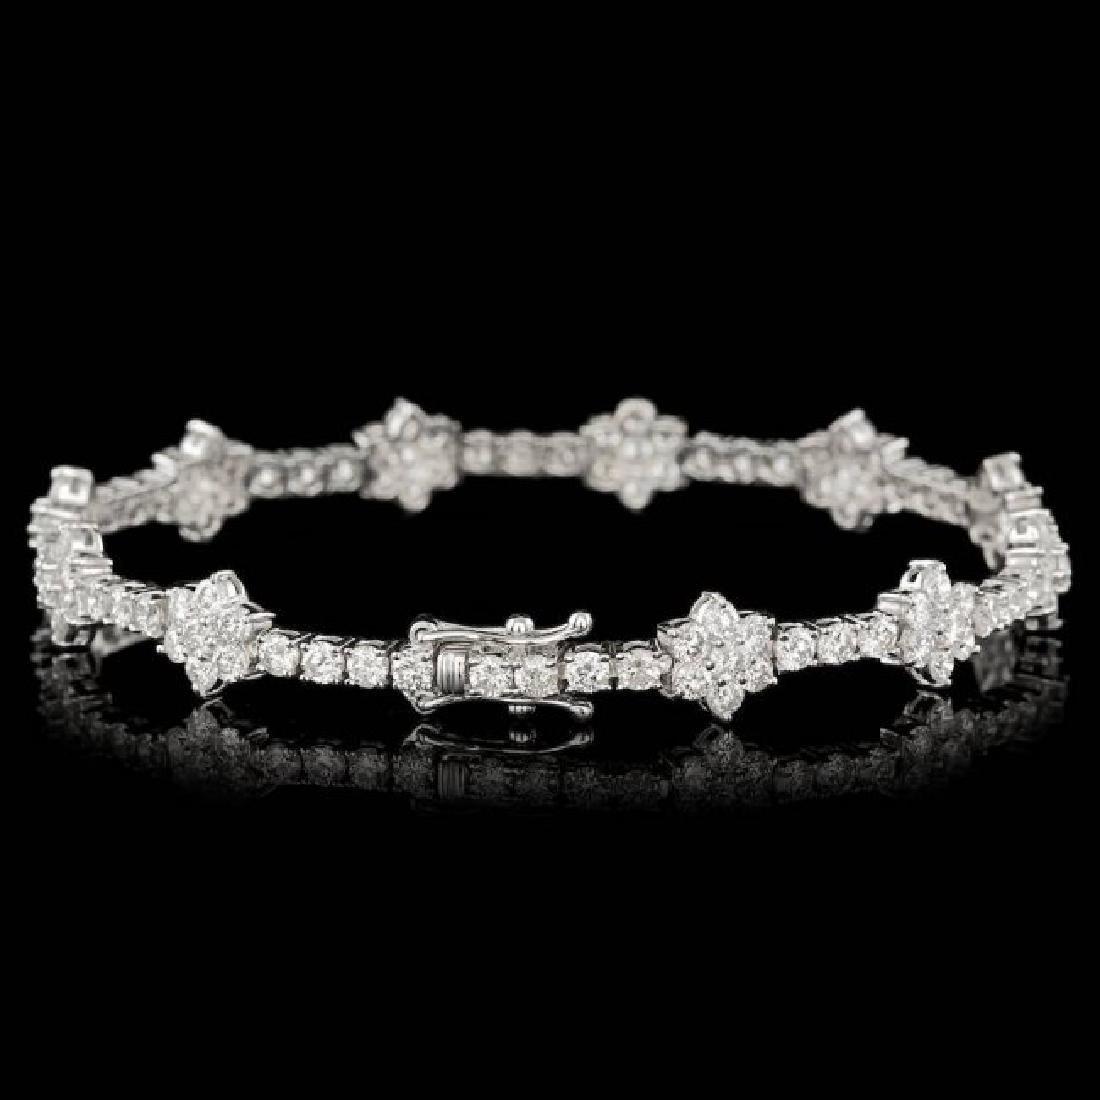 18k White Gold 6.80ct Diamond Bracelet - 3